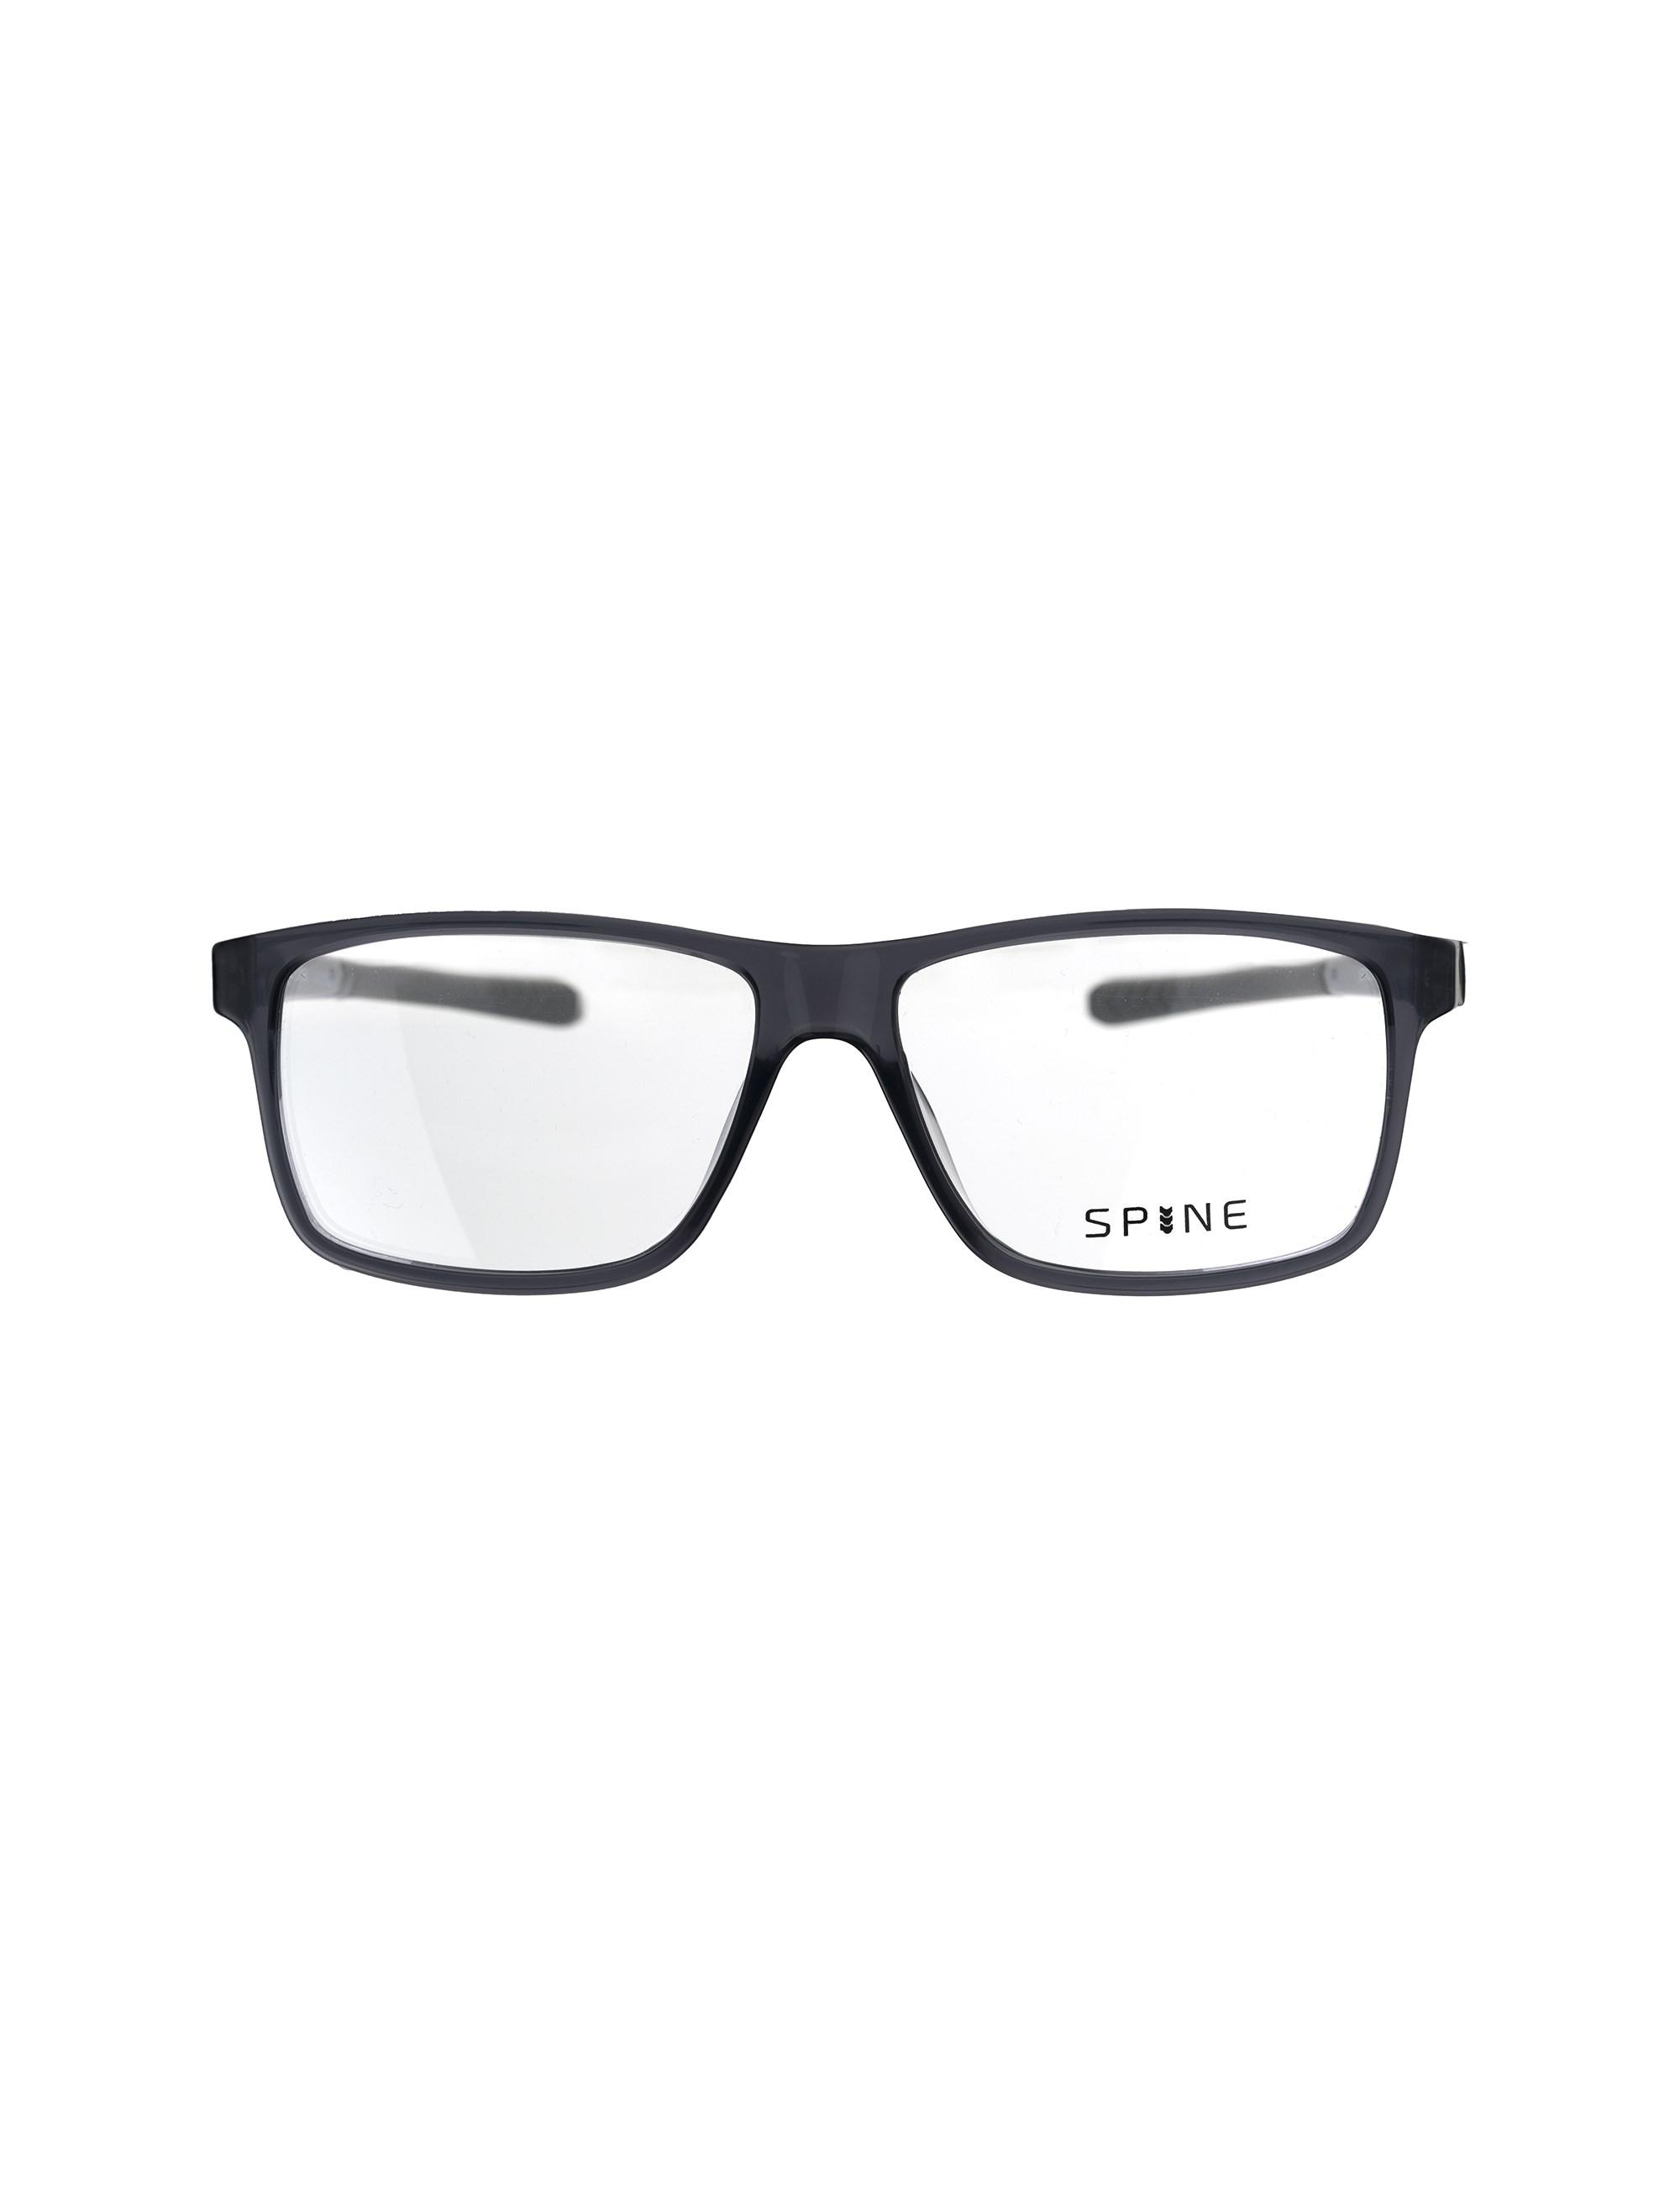 عینک طبی ویفرر زنانه - طوسي - 1